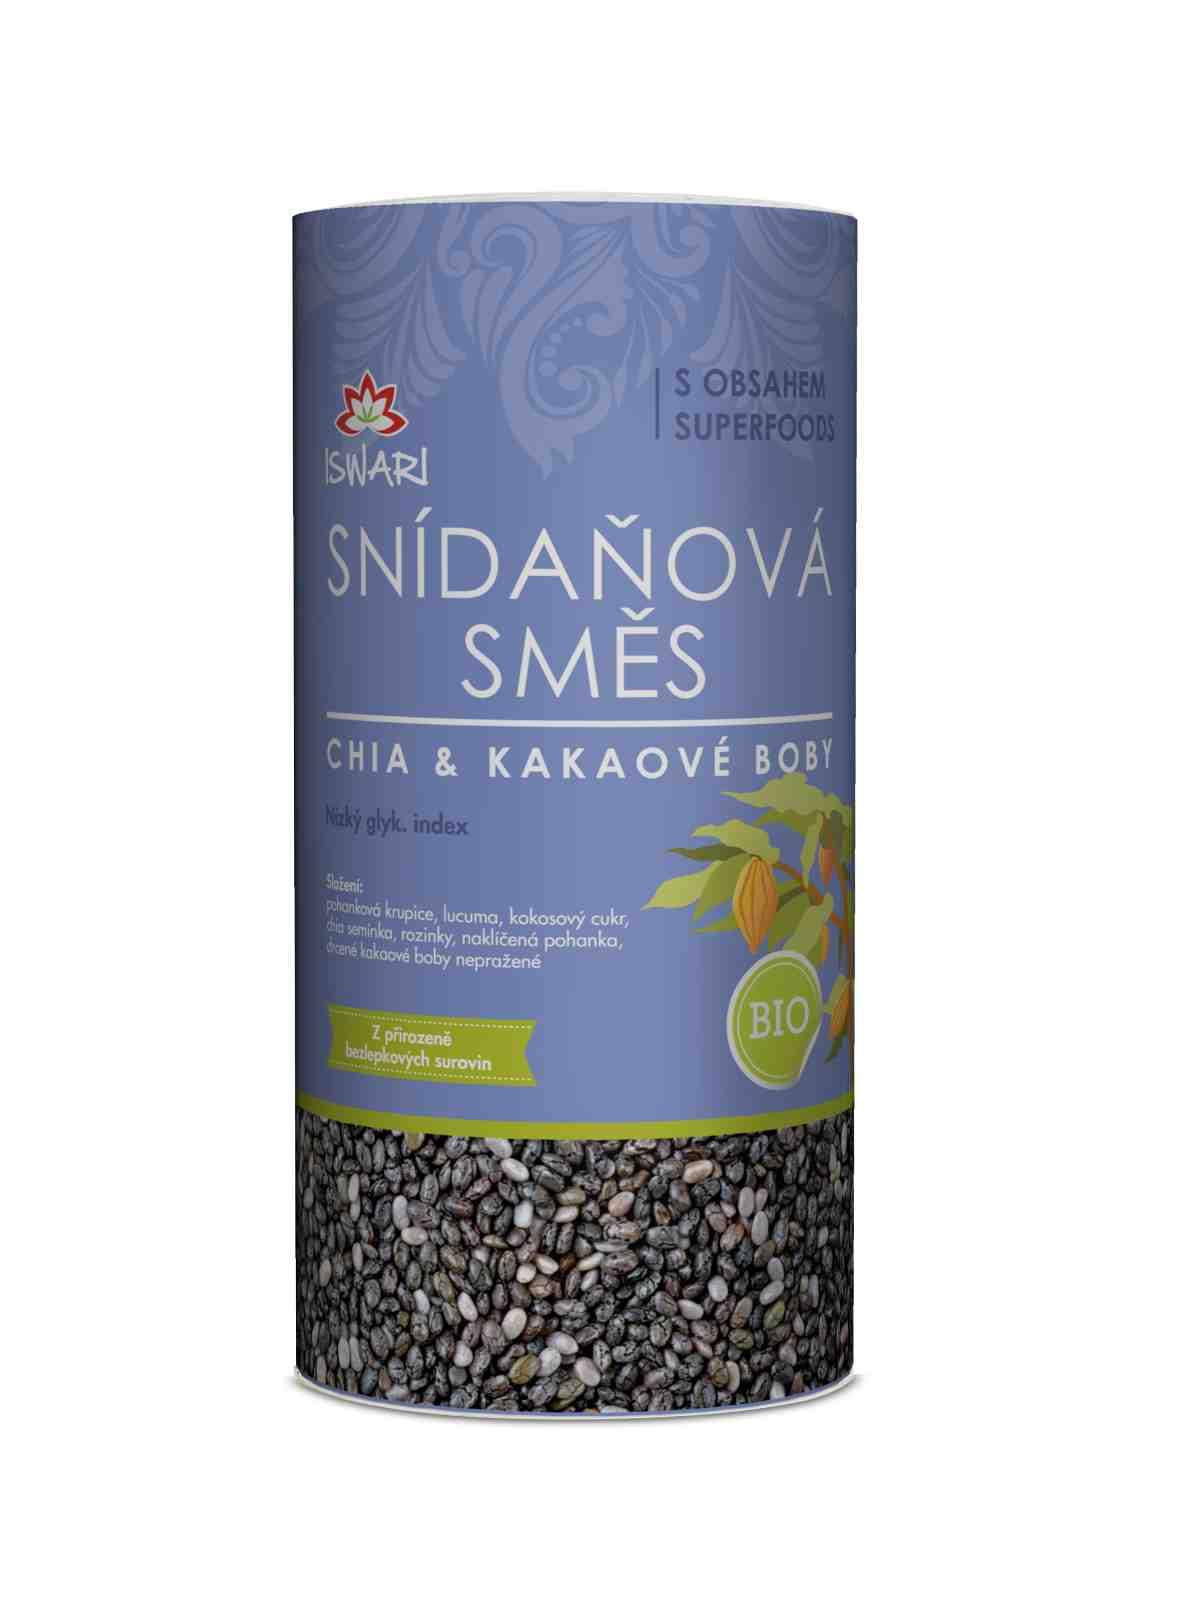 Iswari Bio Snídaňová směs Chia & kakaové boby 360 g